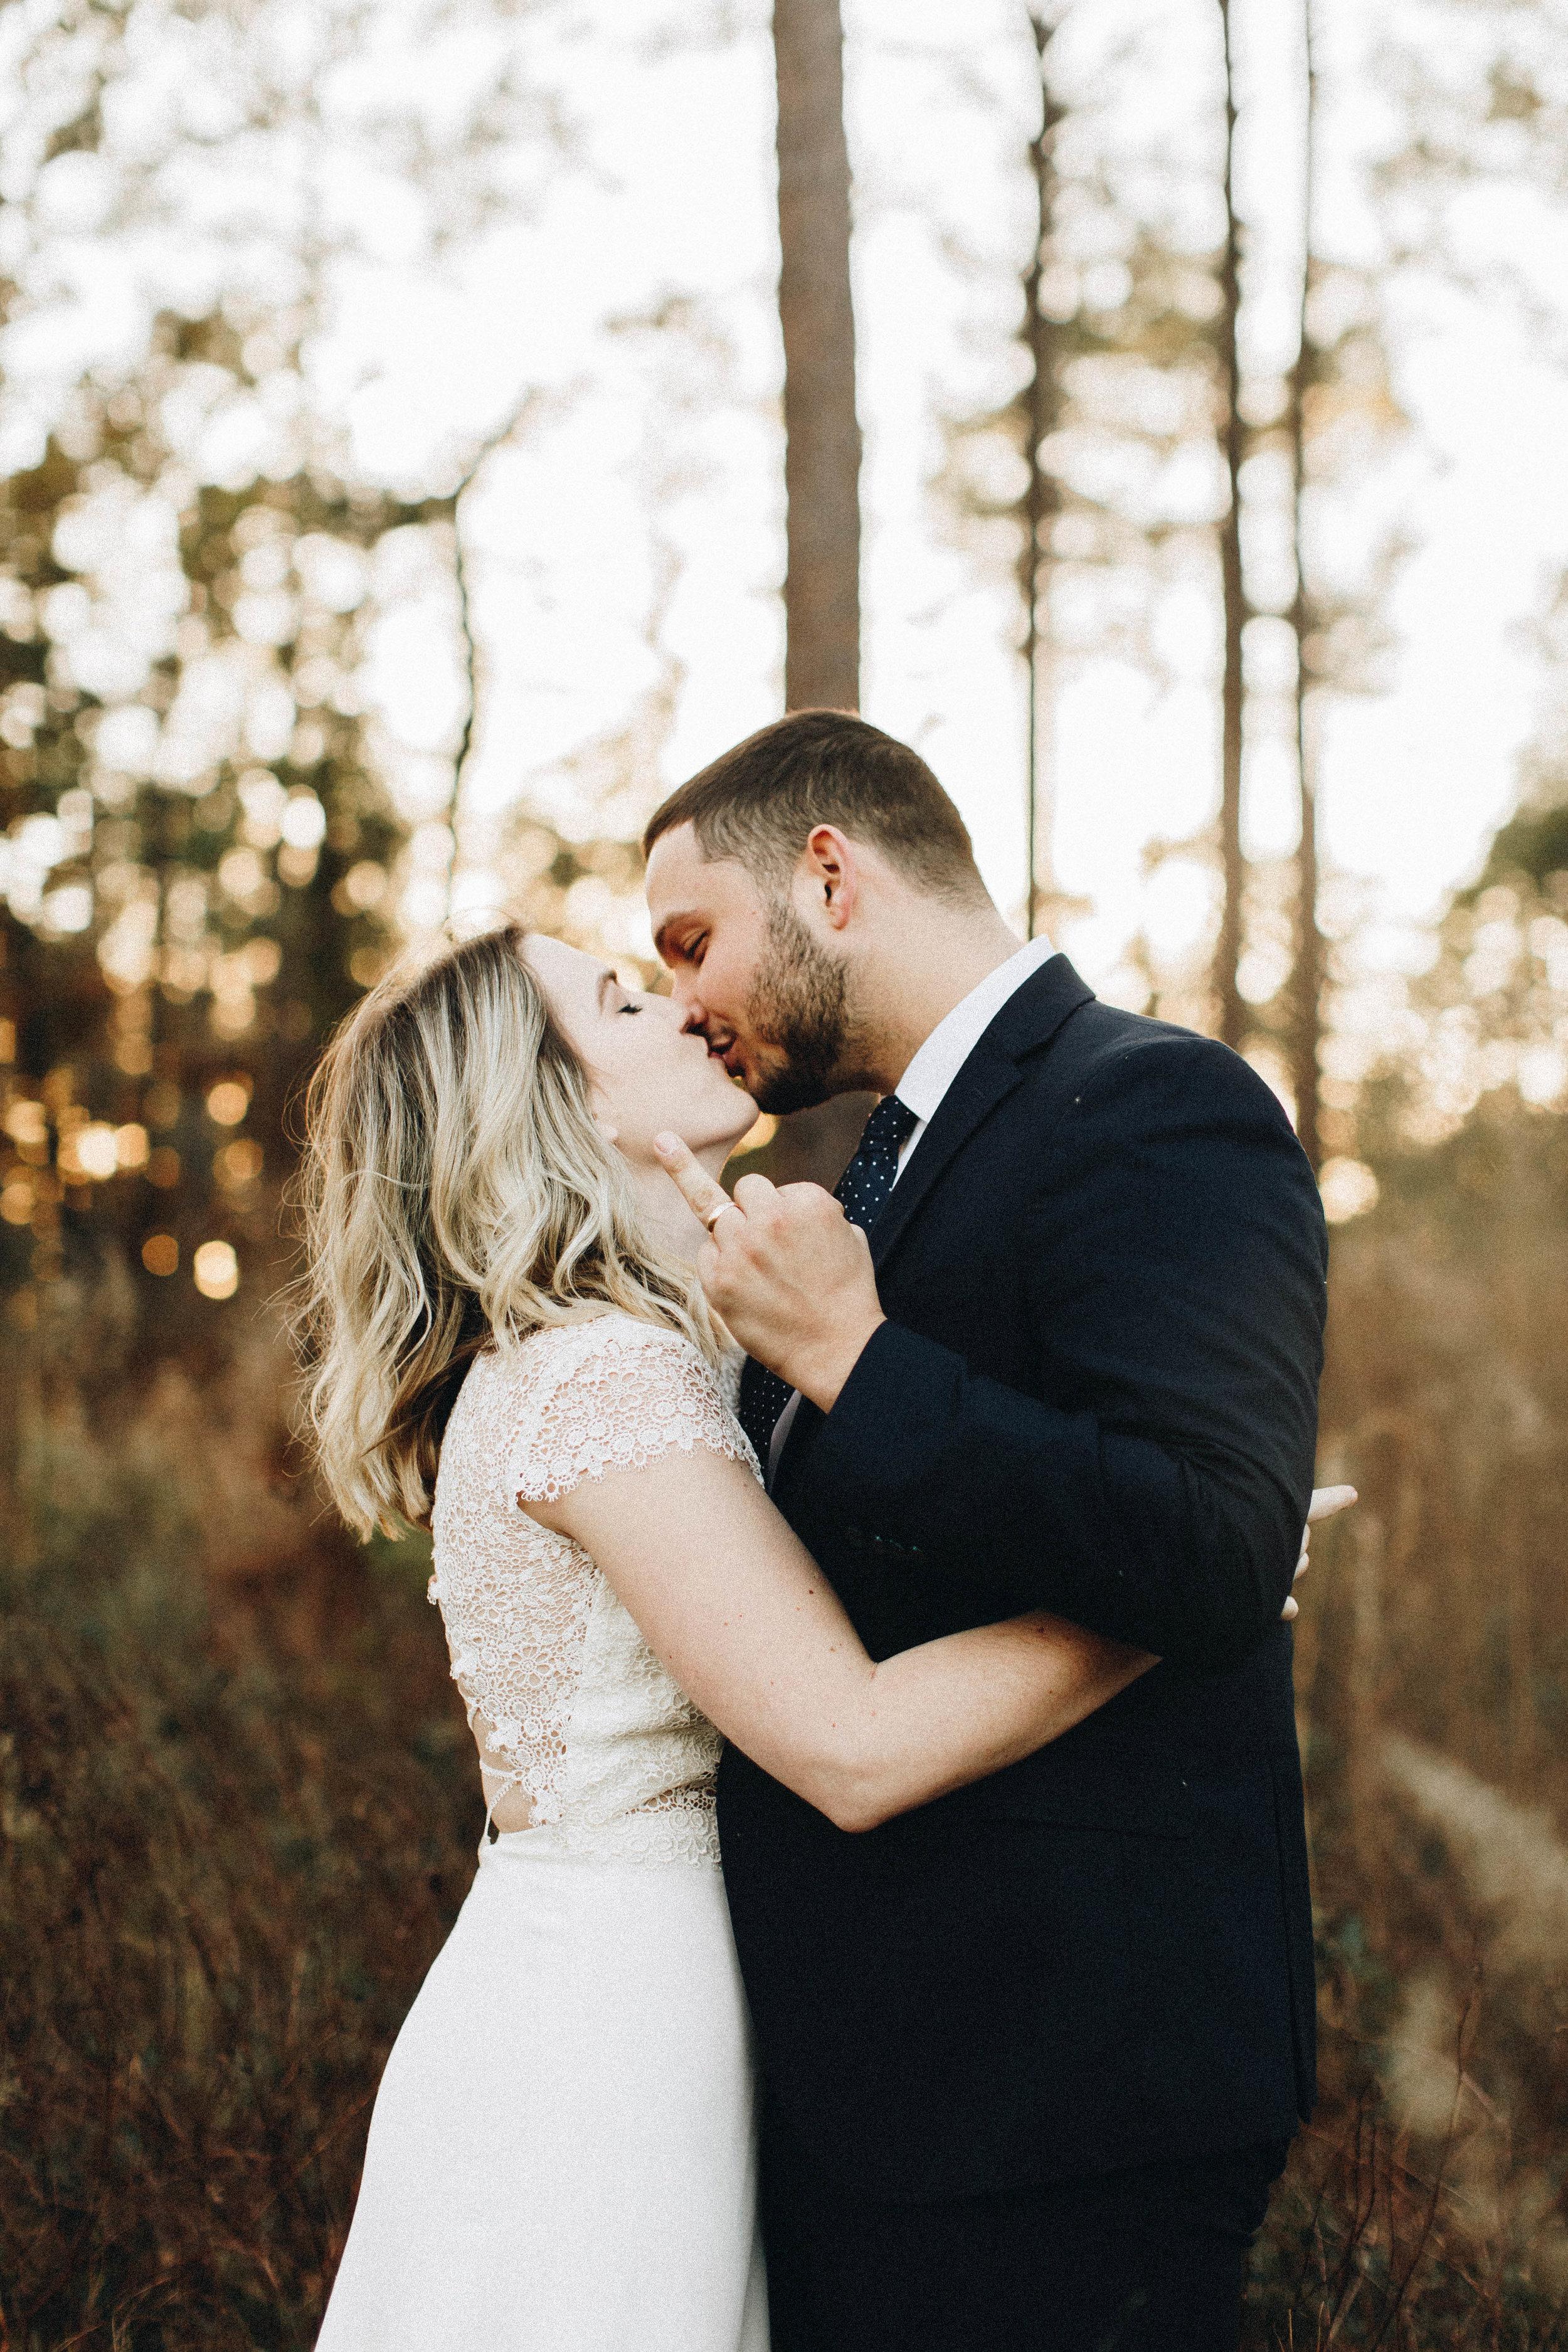 Orlando+wedding+photographer-39.jpeg